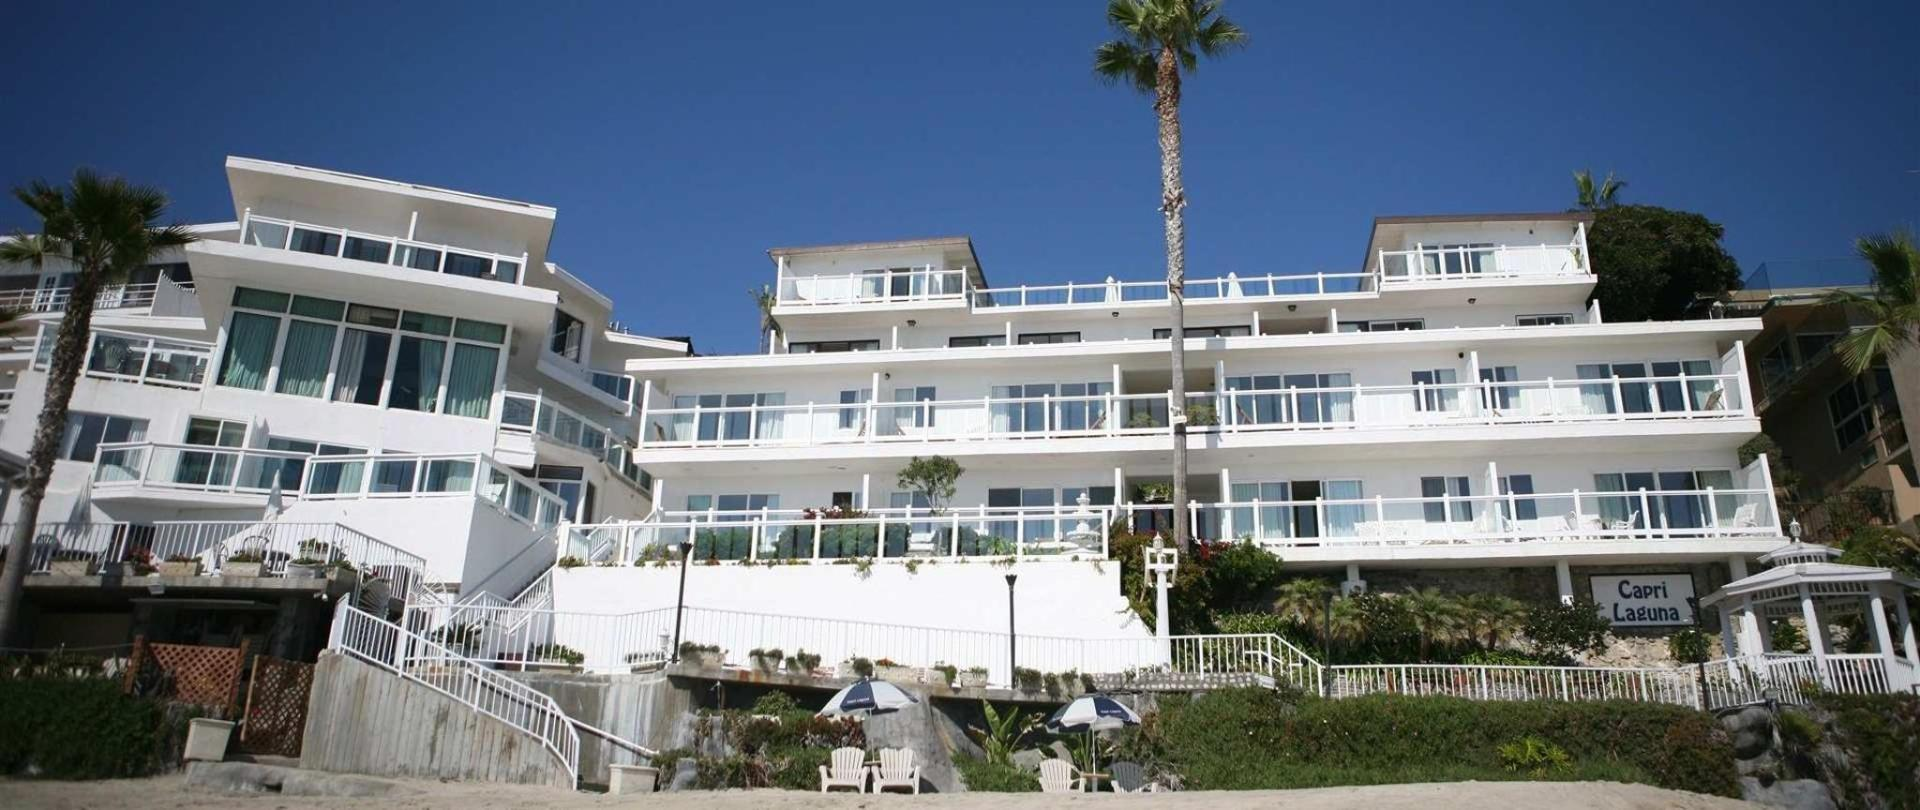 capri laguna on the beach laguna beach ca usa capri. Black Bedroom Furniture Sets. Home Design Ideas